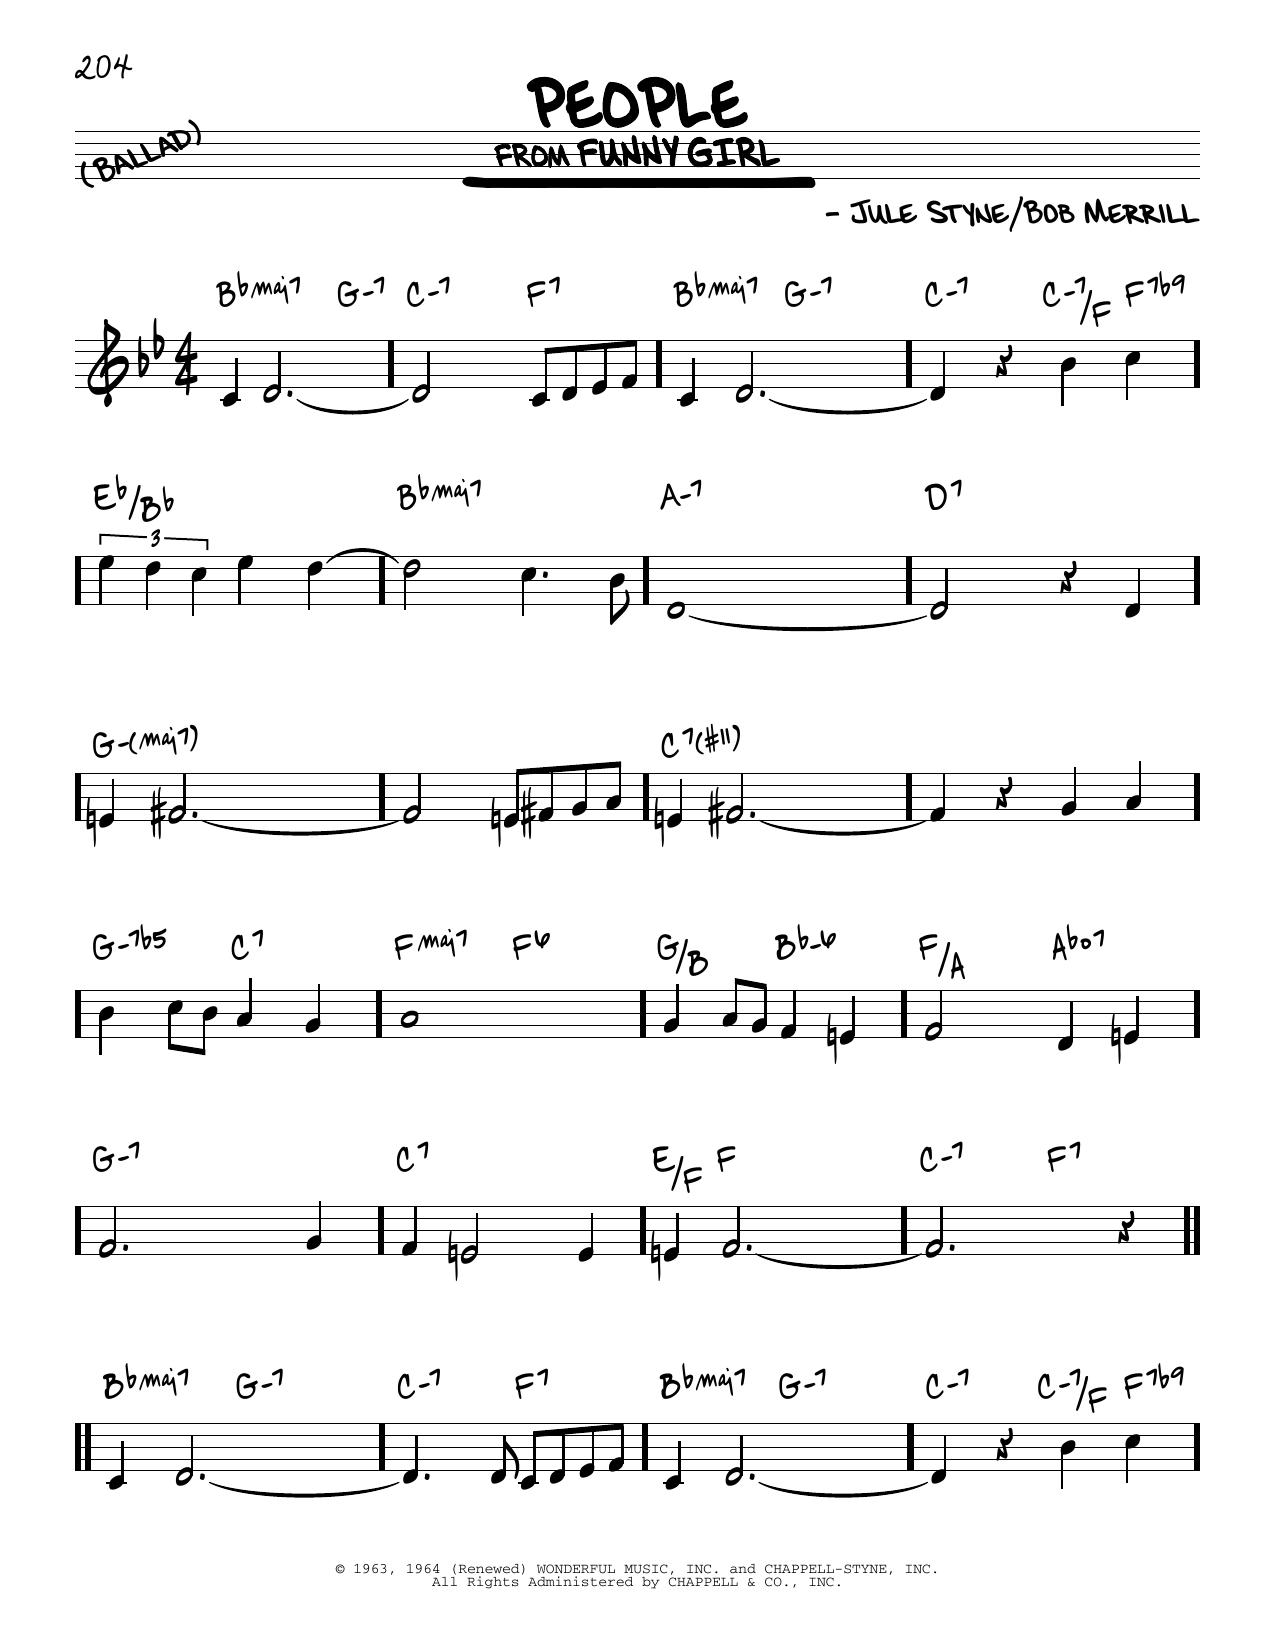 Jule Styne People sheet music notes and chords. Download Printable PDF.